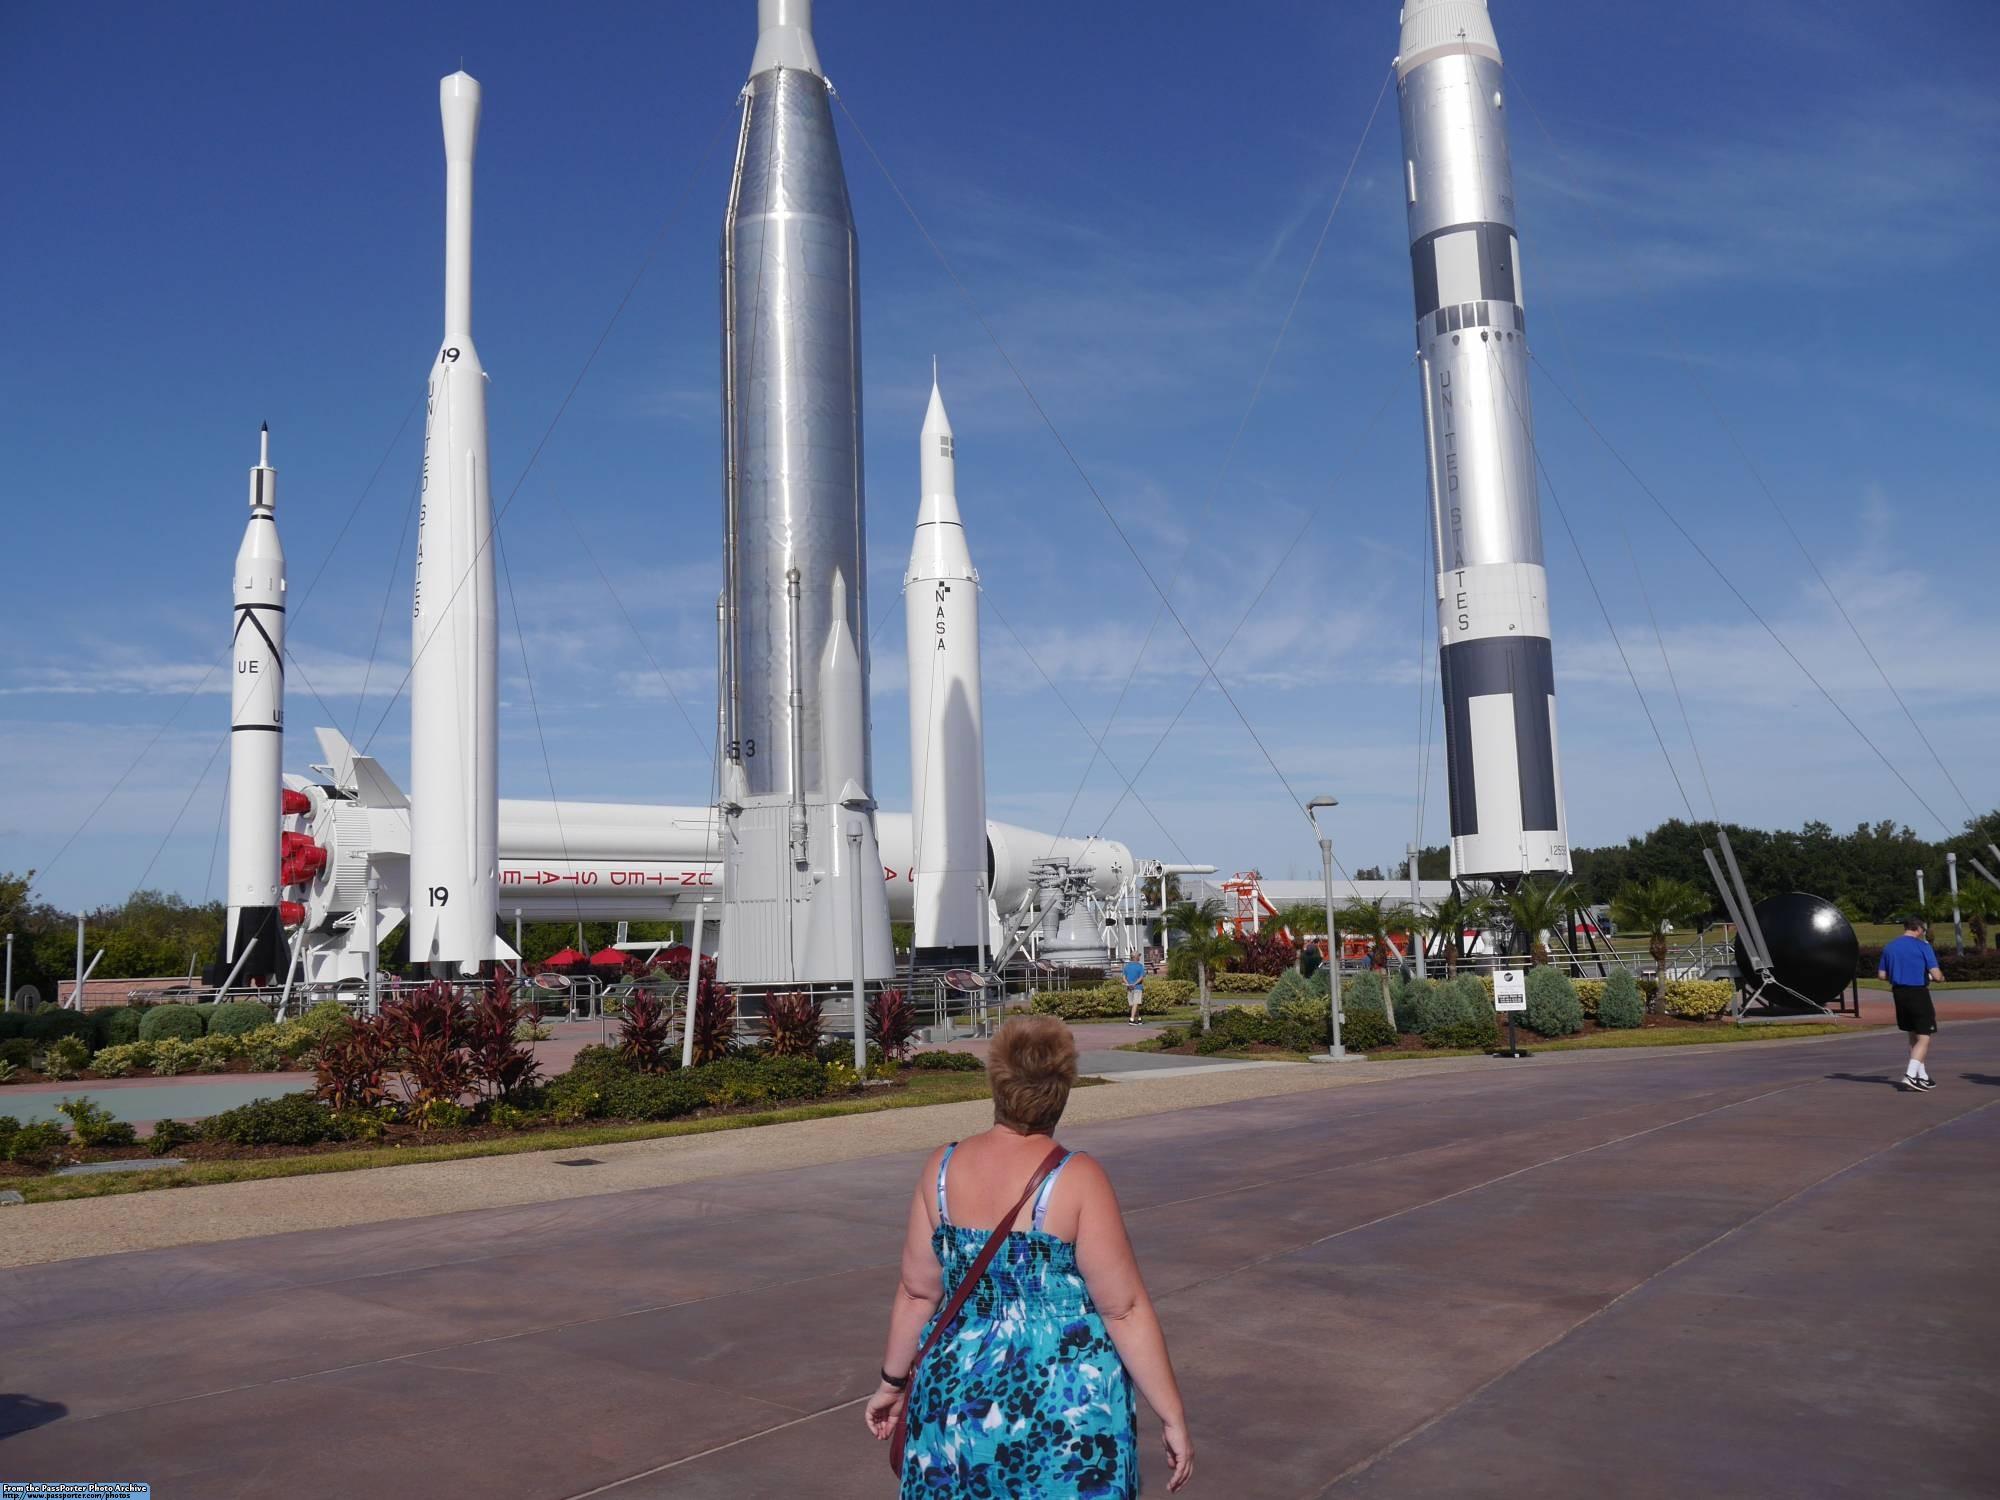 Explore Kennedy Space Center in Cape Canaveral, Florida | PassPorter.com